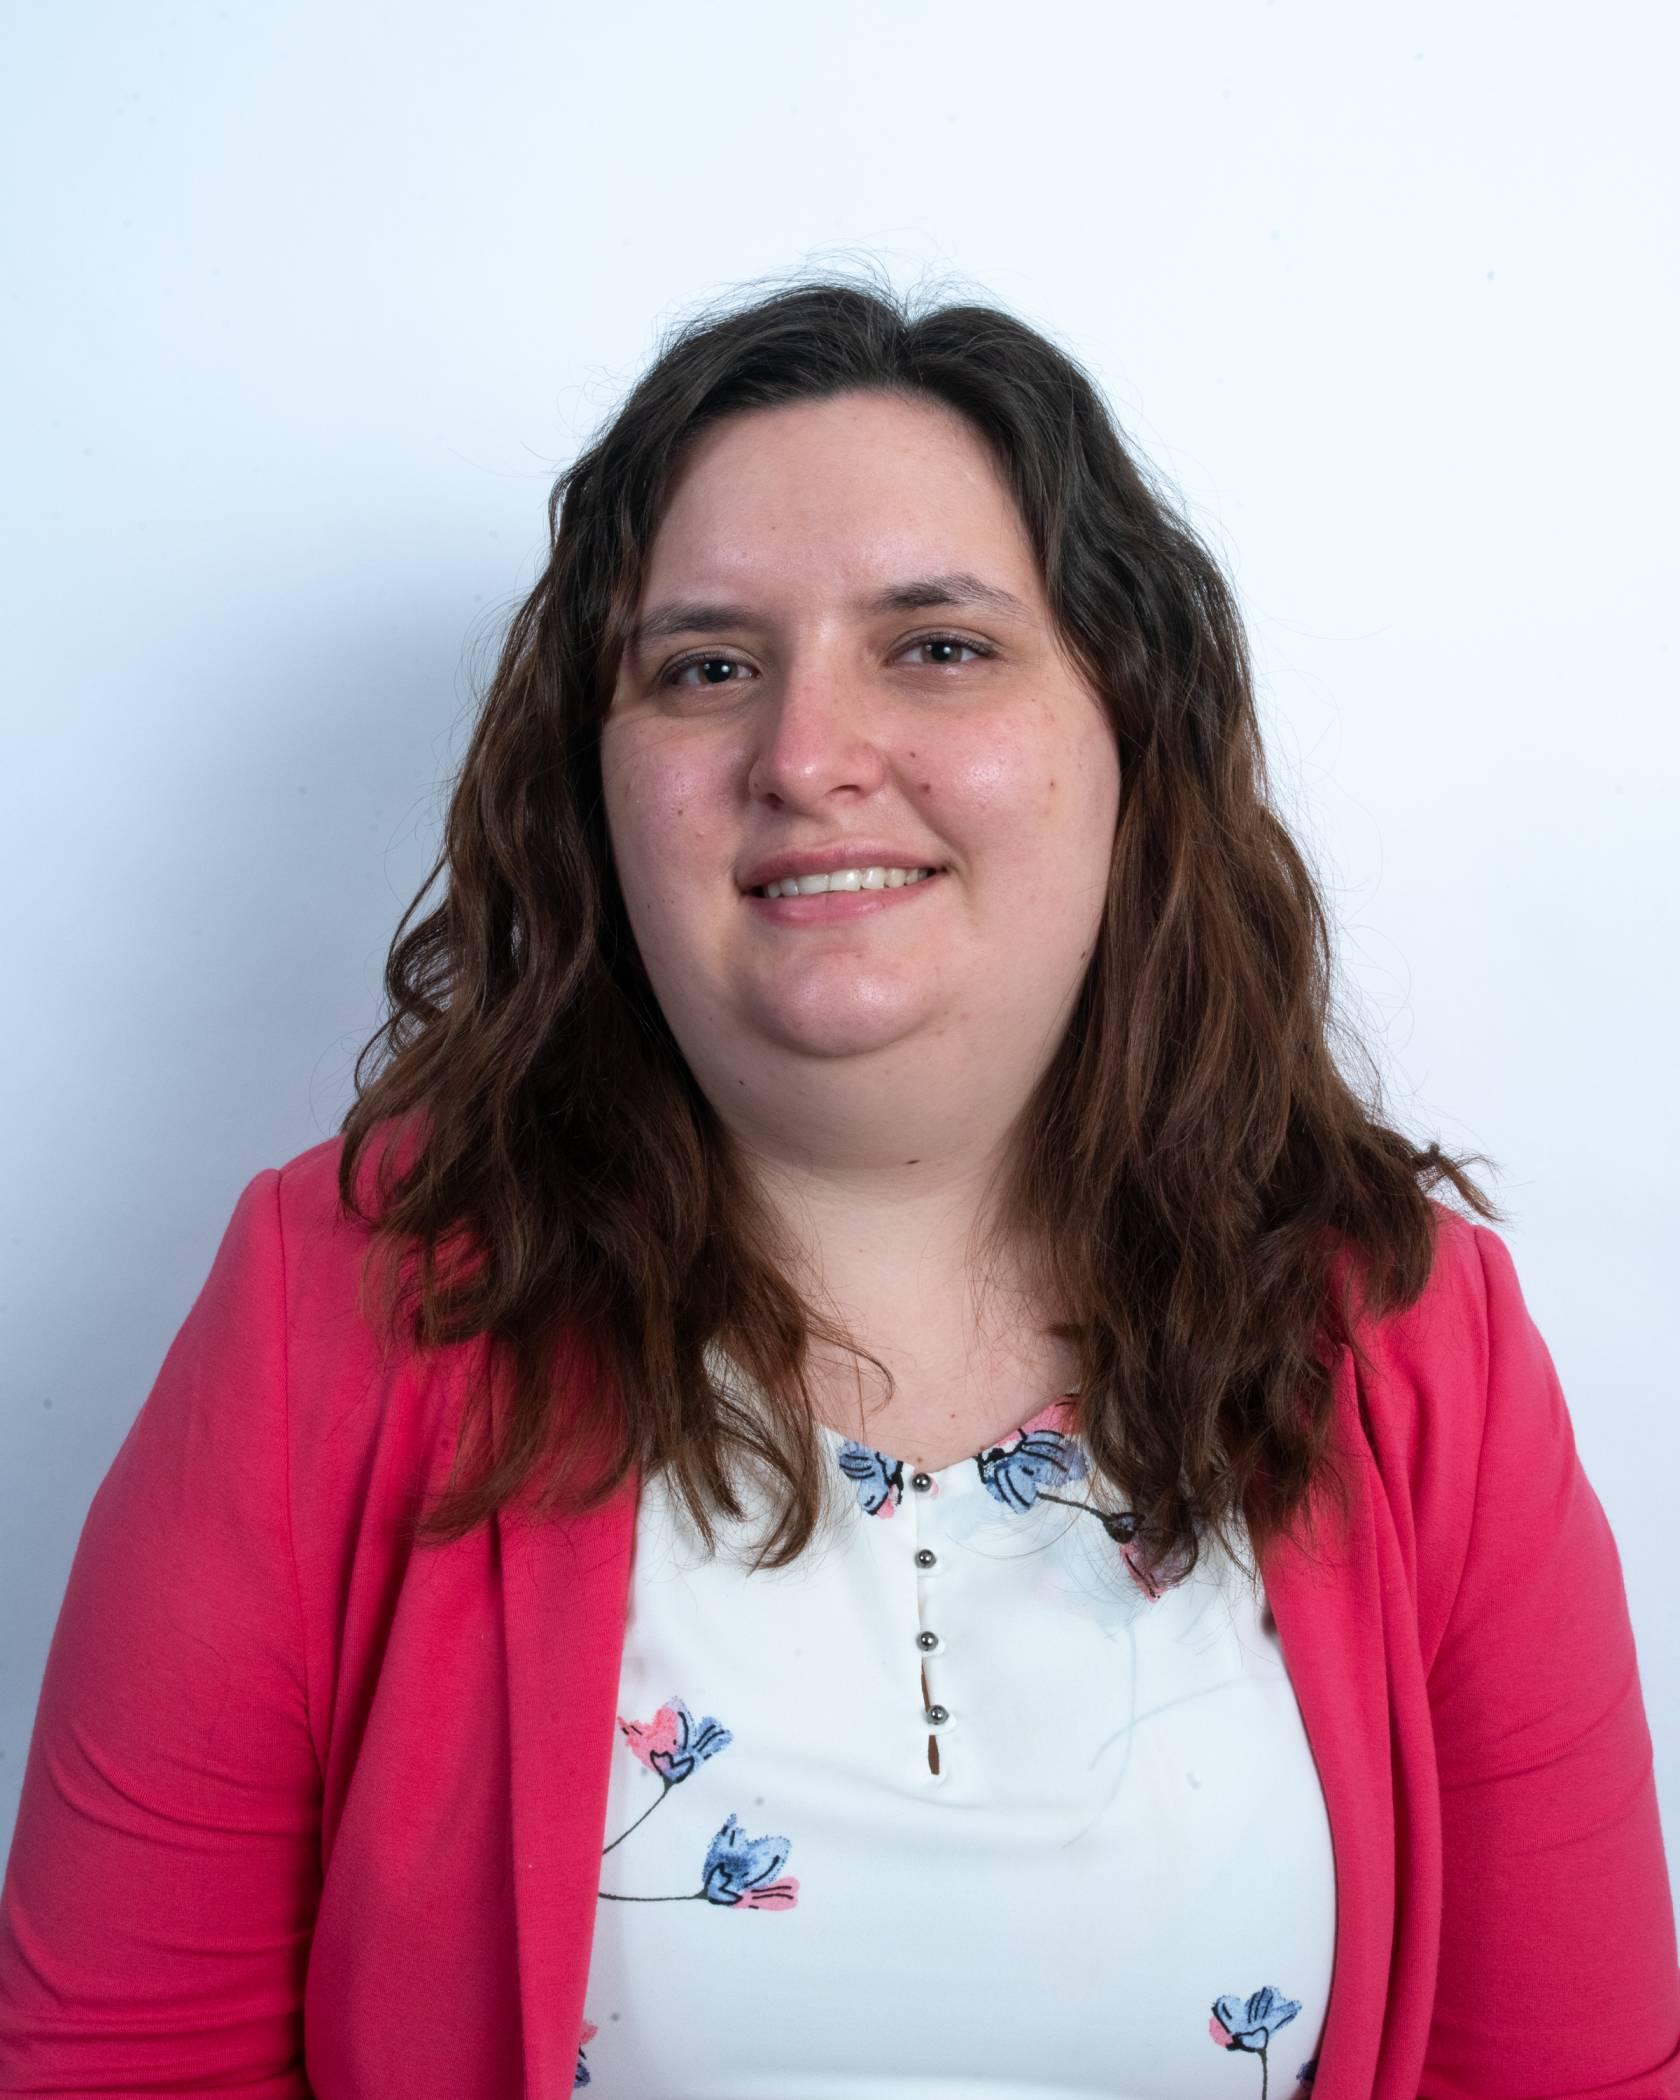 Tamara Iwanchyshyn Film & Television Production Advanced Diploma Program Graduate